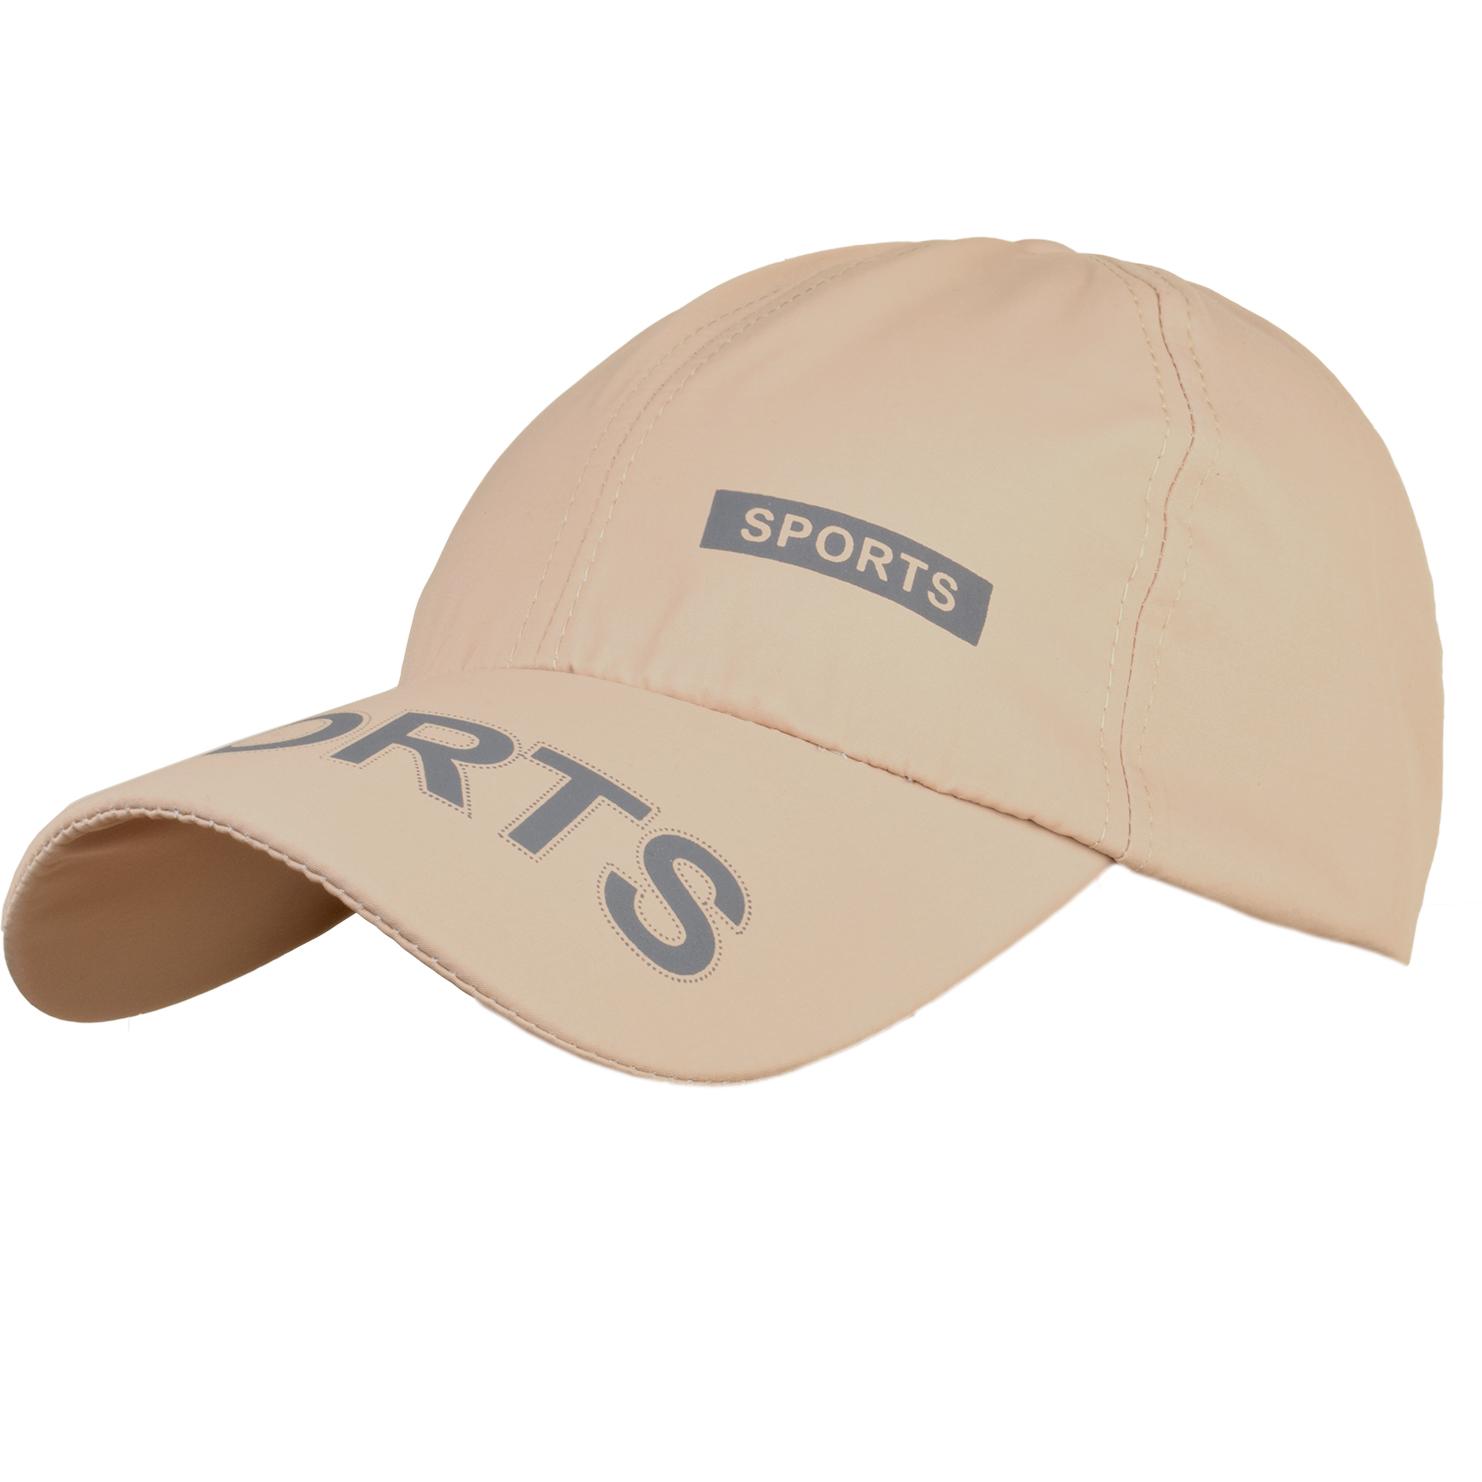 قیمت کلاه کپ کد R1330